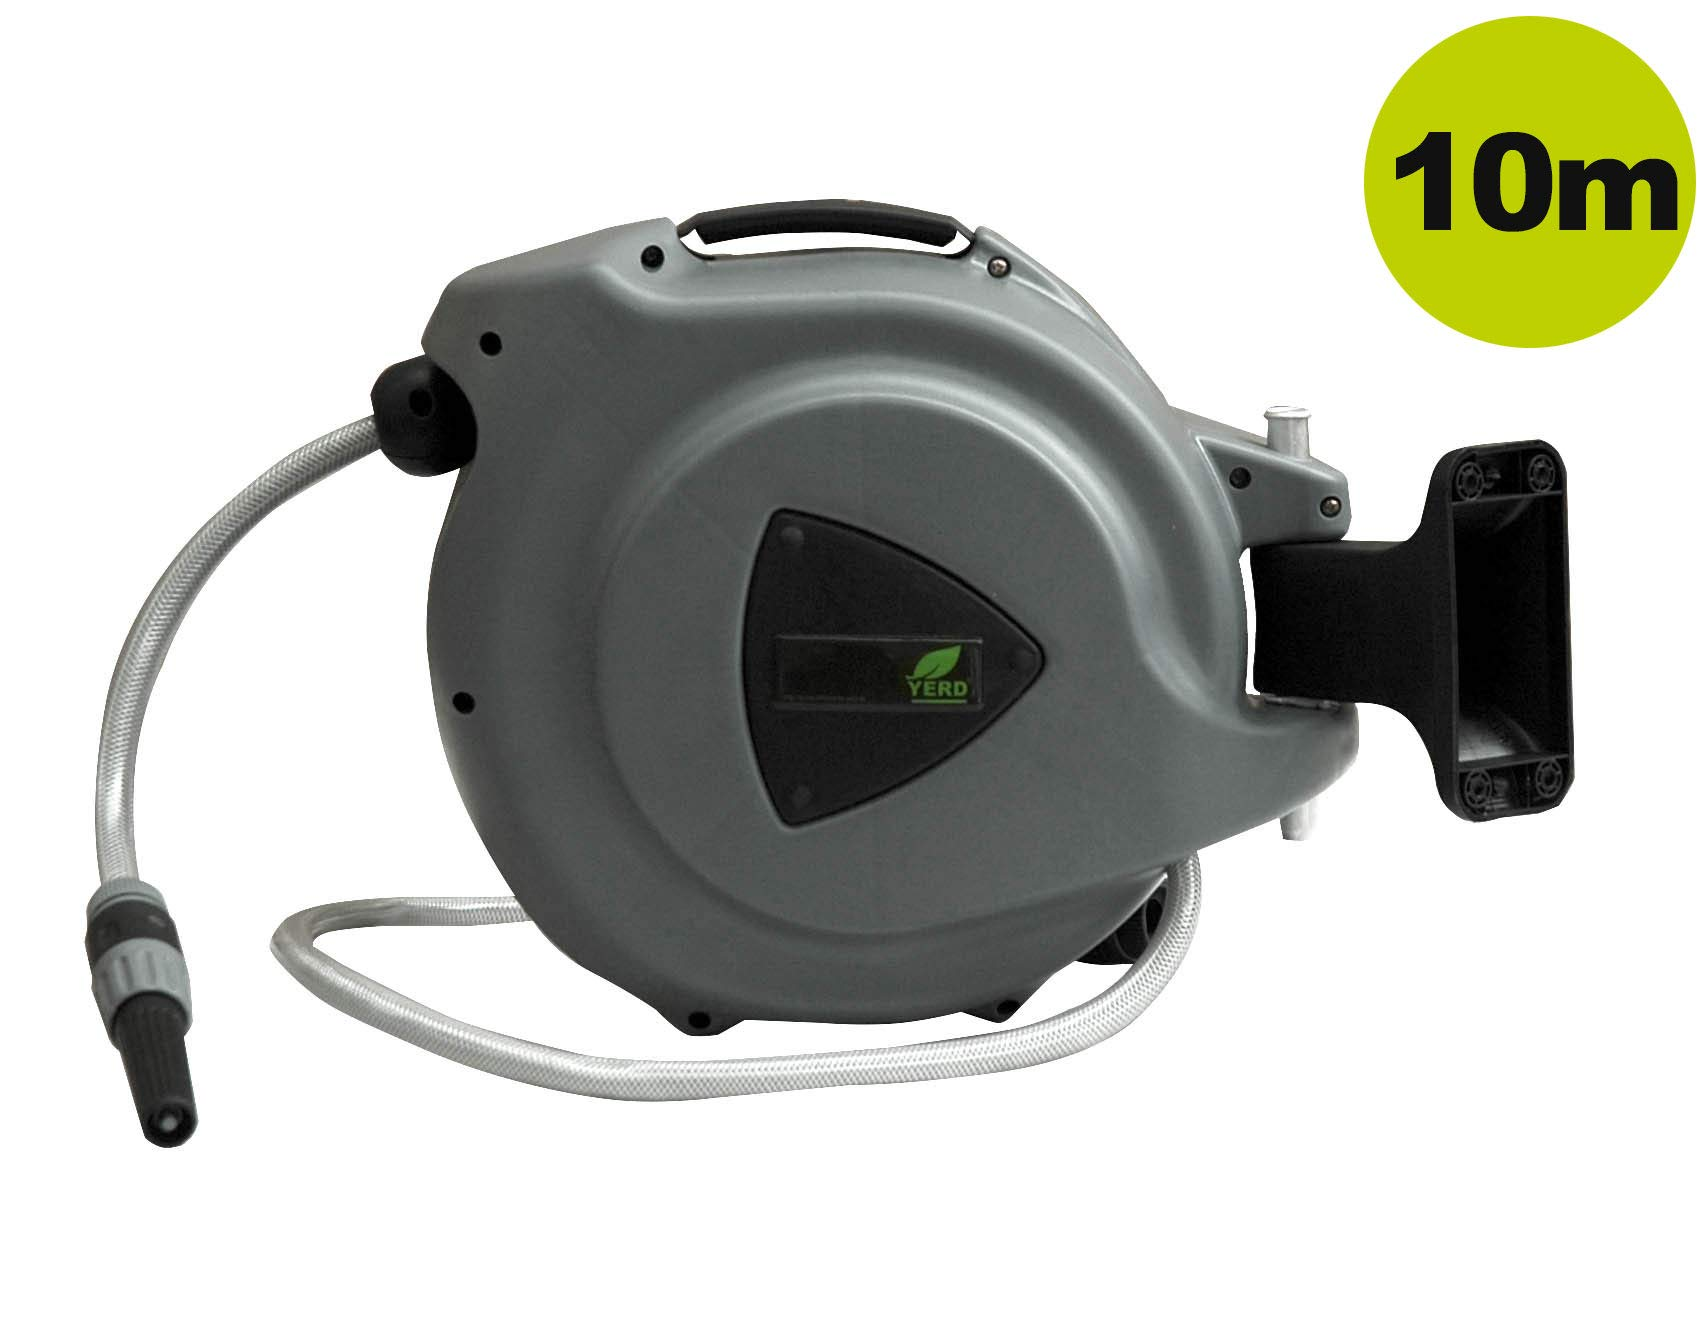 Enrollador automático de manguera de YERD / carrete porta mangueras o caja de manguera portátil con soporte